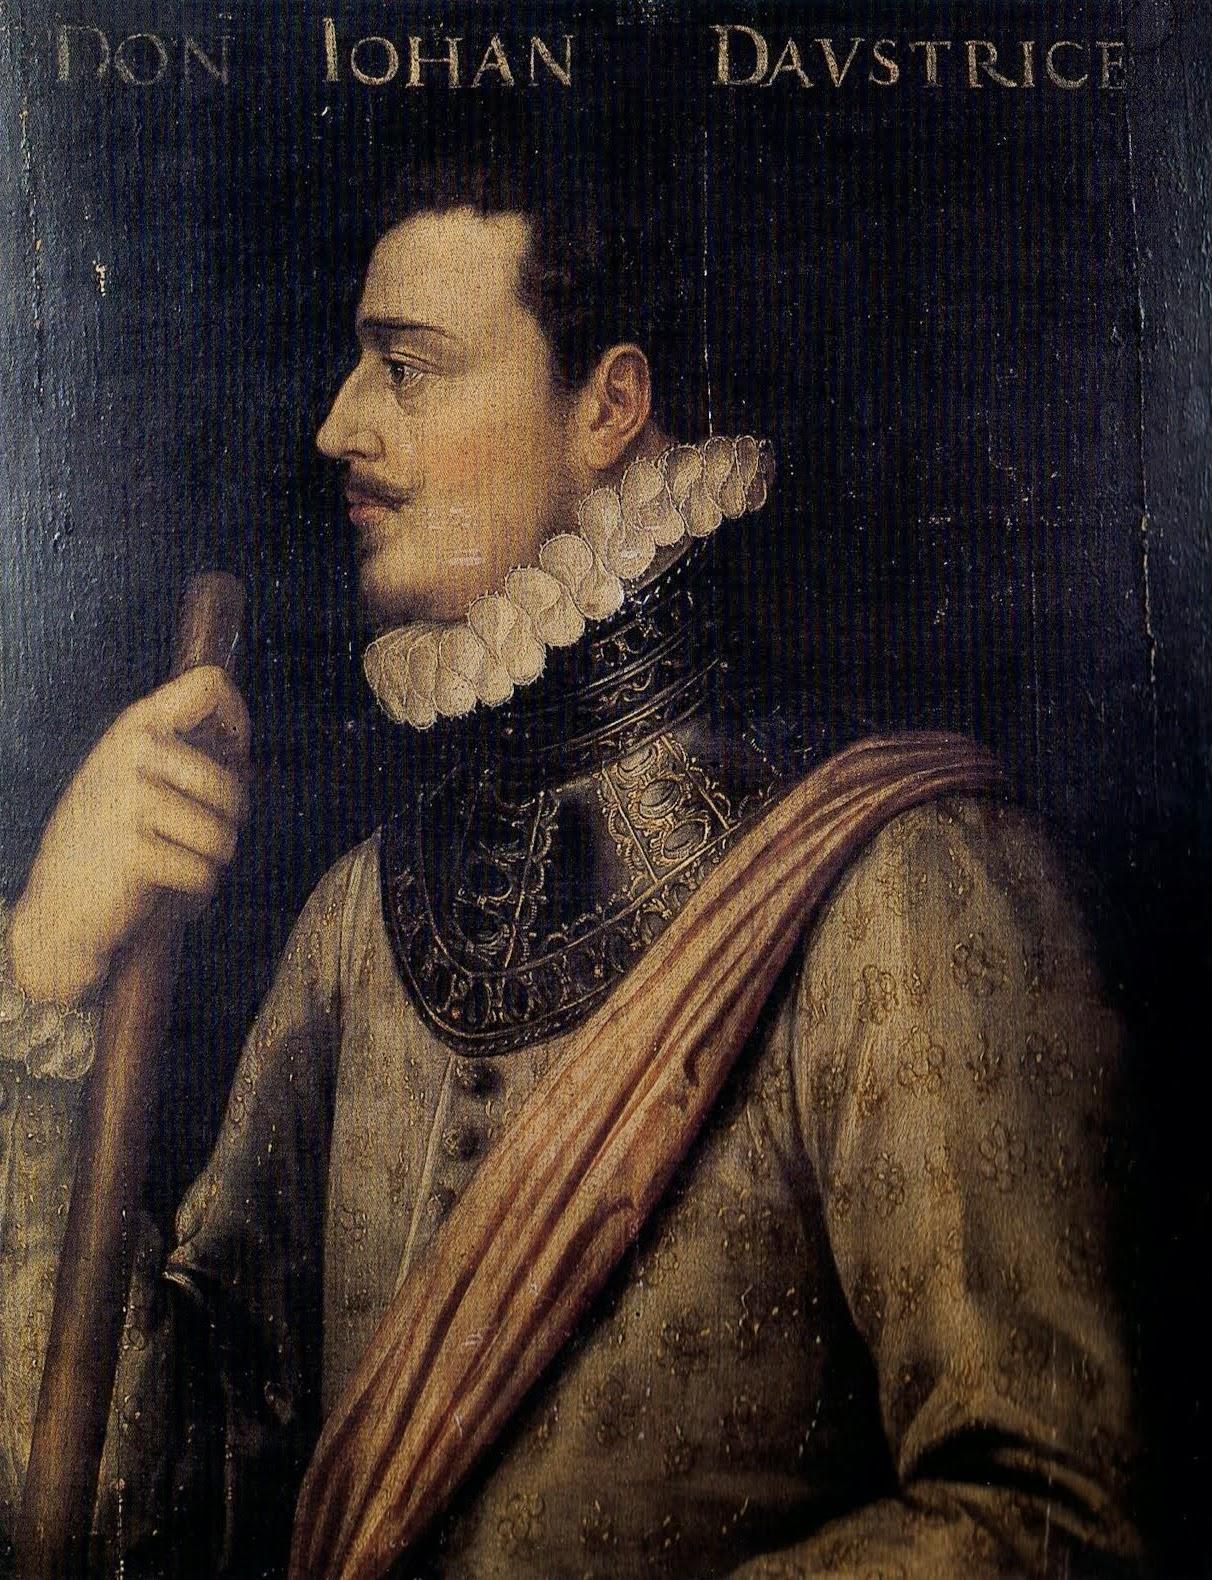 https://nobility.org/wp-content/uploads/2010/10/Don-Juan-de-Austria.jpg